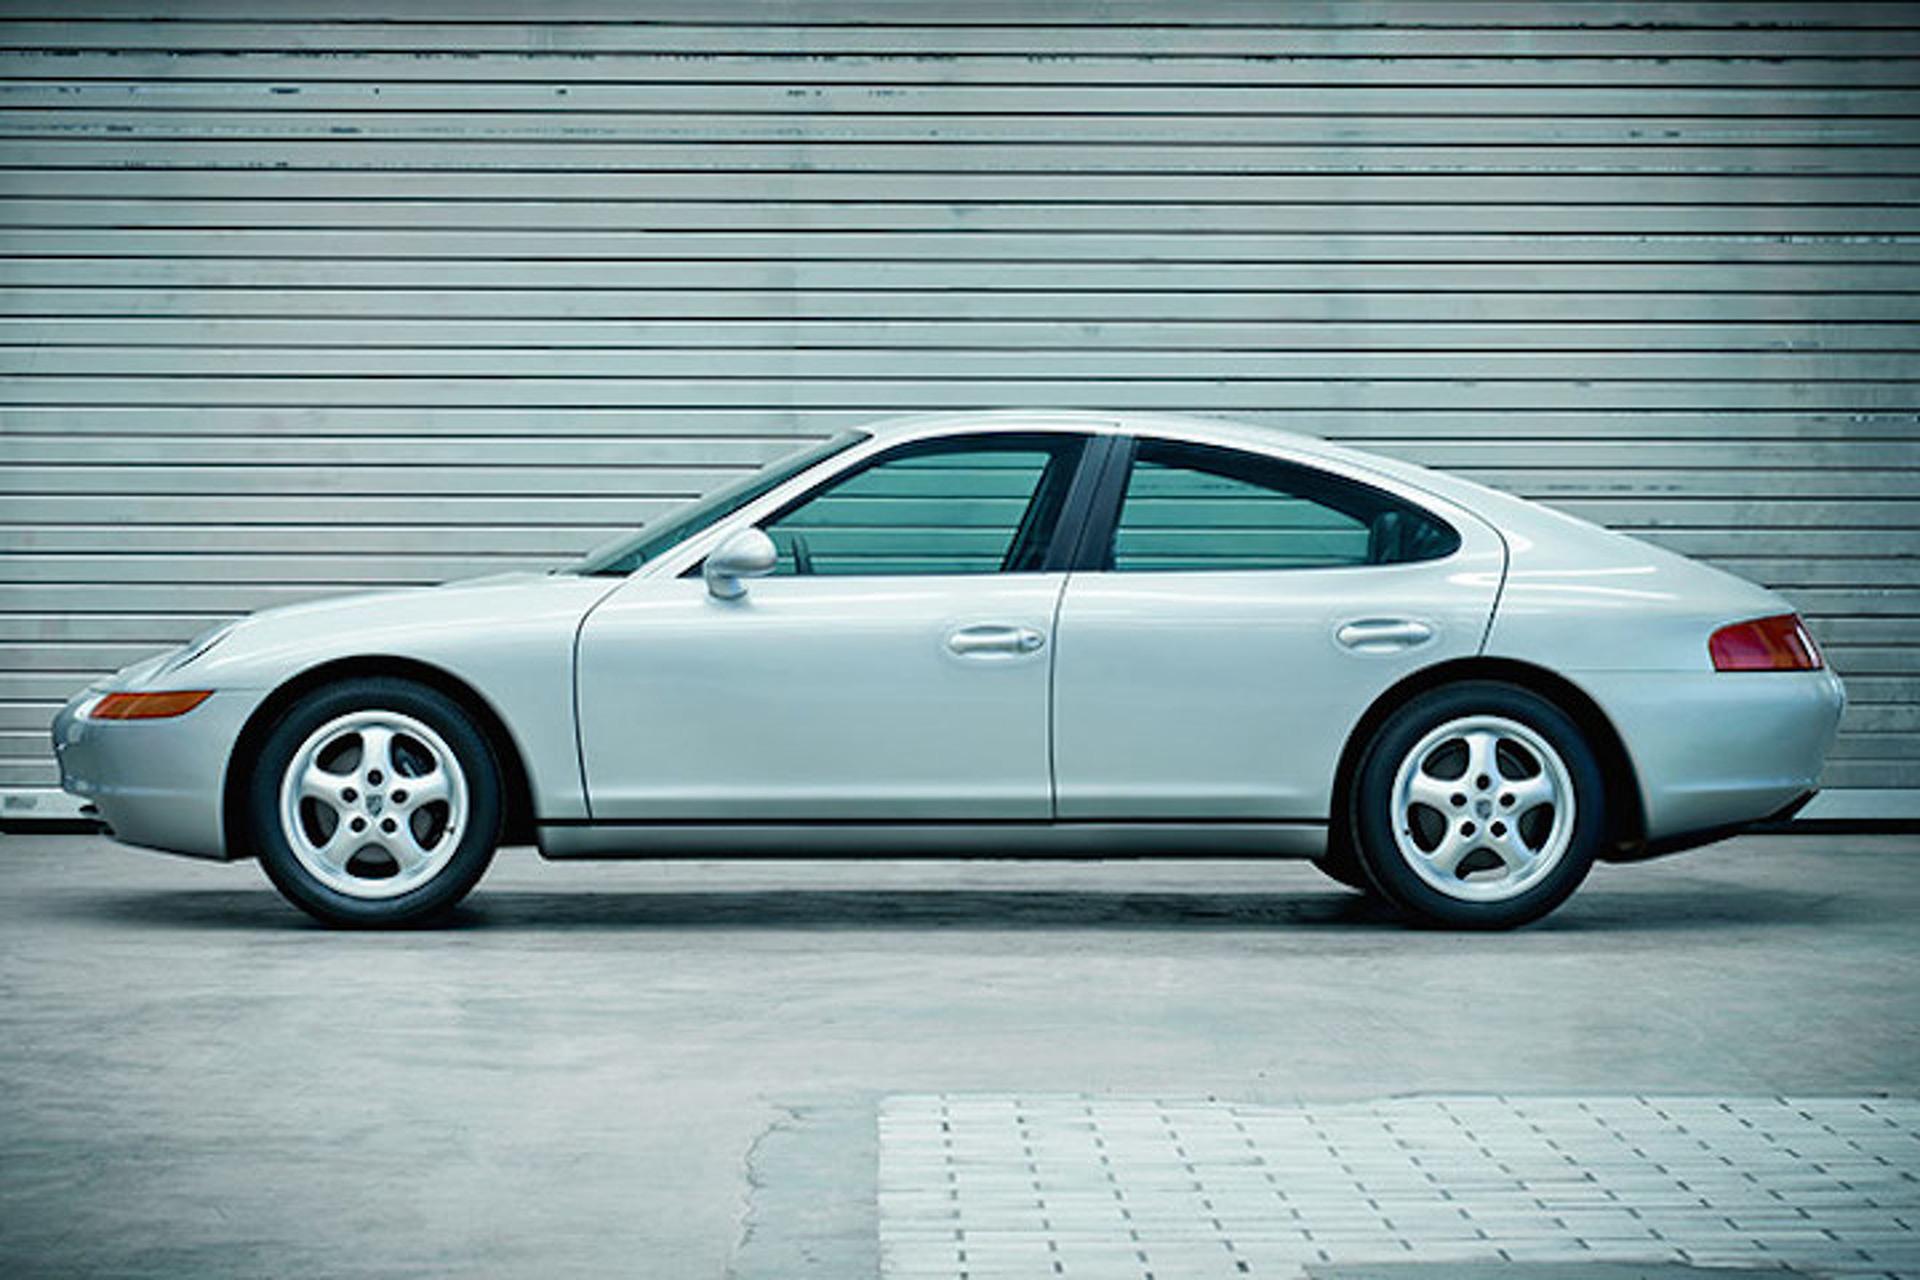 Catch a Glimpse of 5 Rare Porsche Prototypes